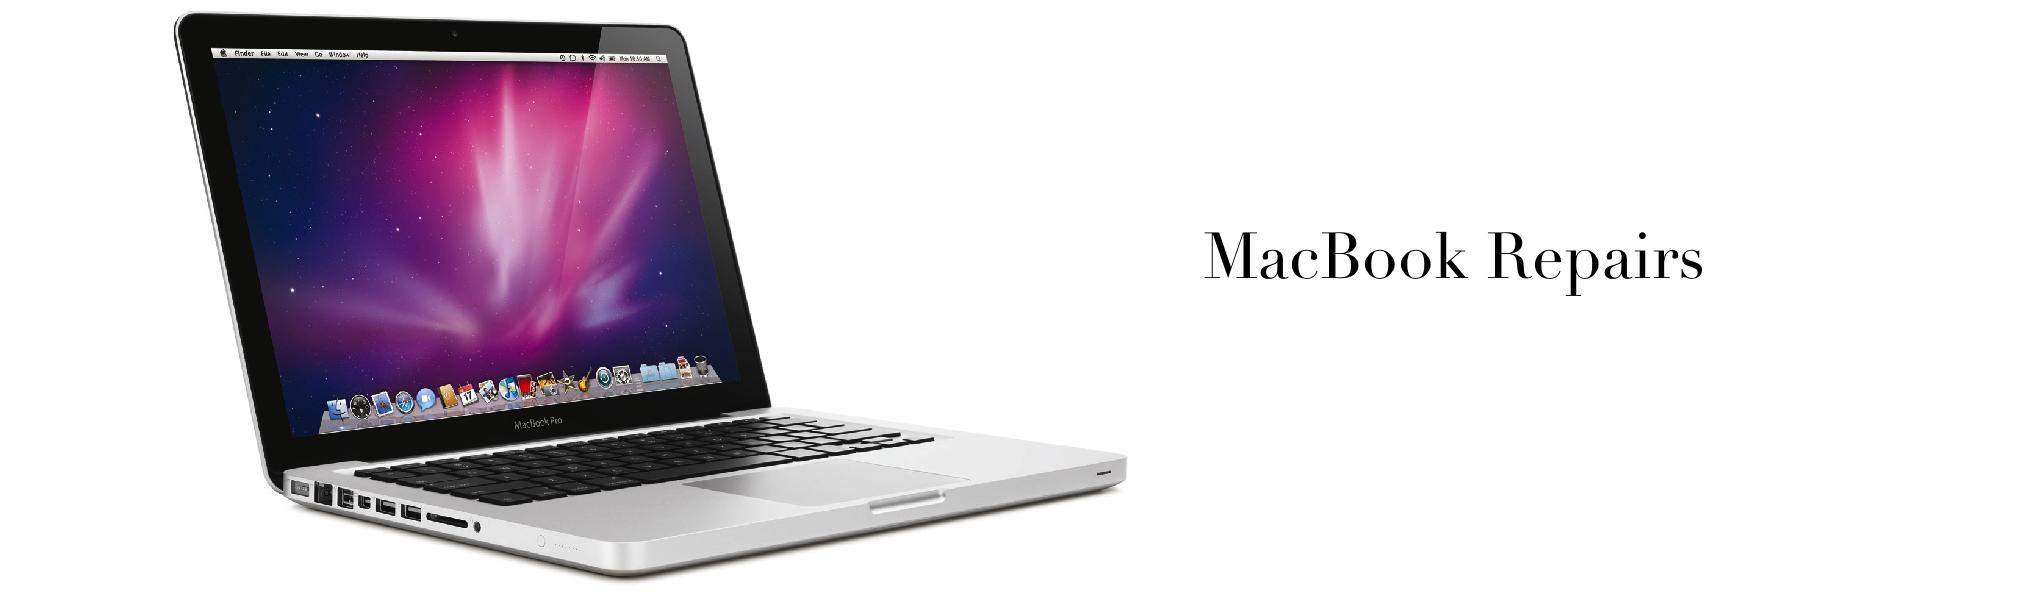 macbook pro repair.jpg